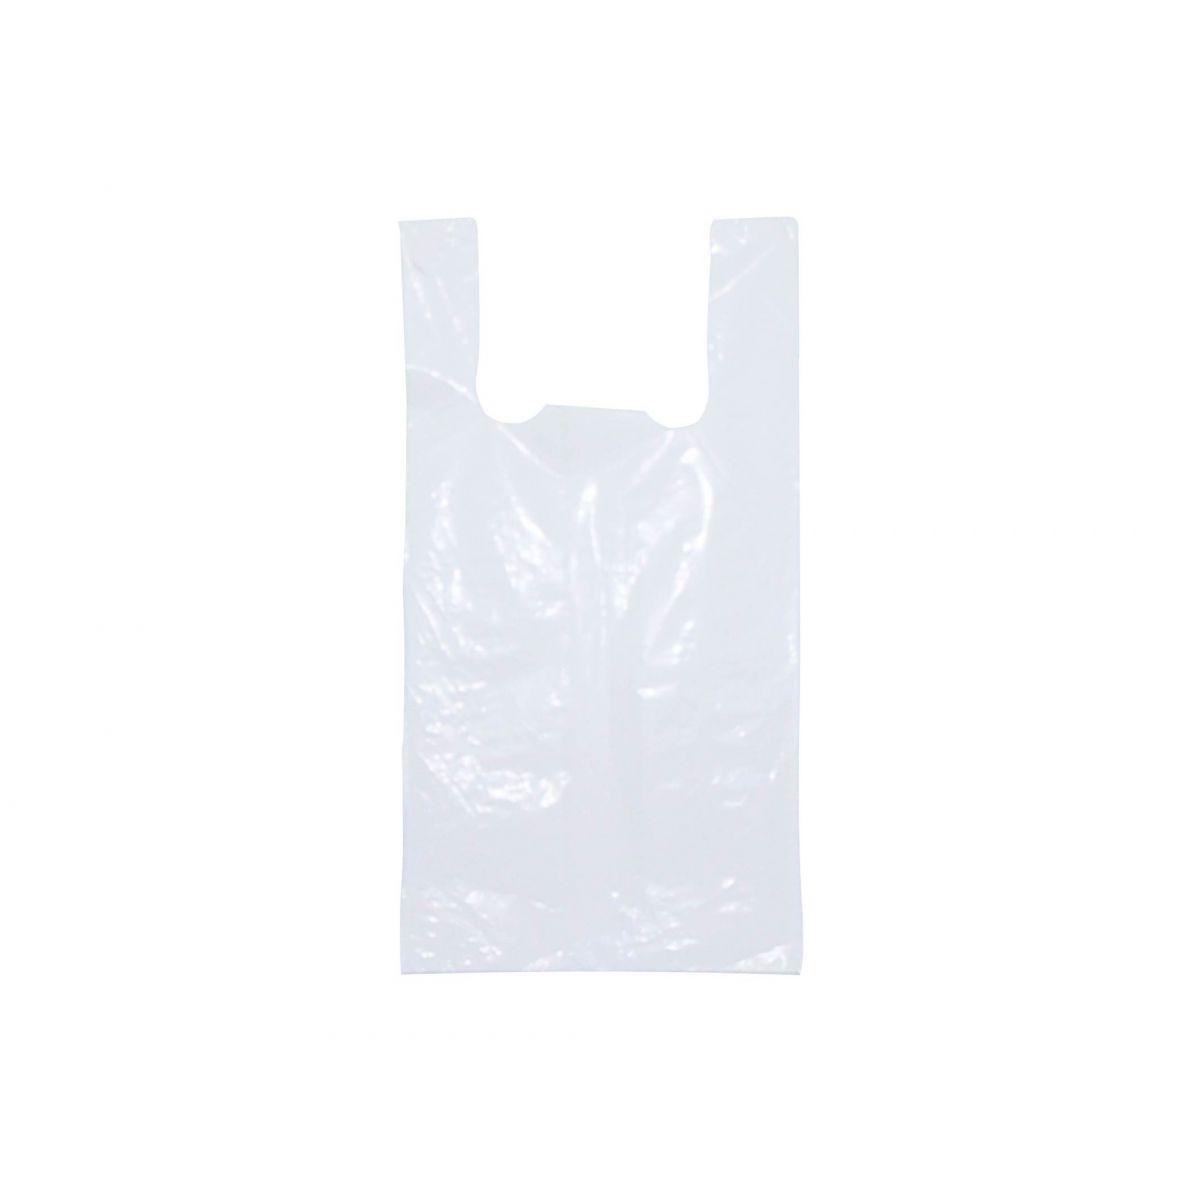 Sacola plástica Branca (espessura fina)- 30x40cm - Pacote 1000 unid